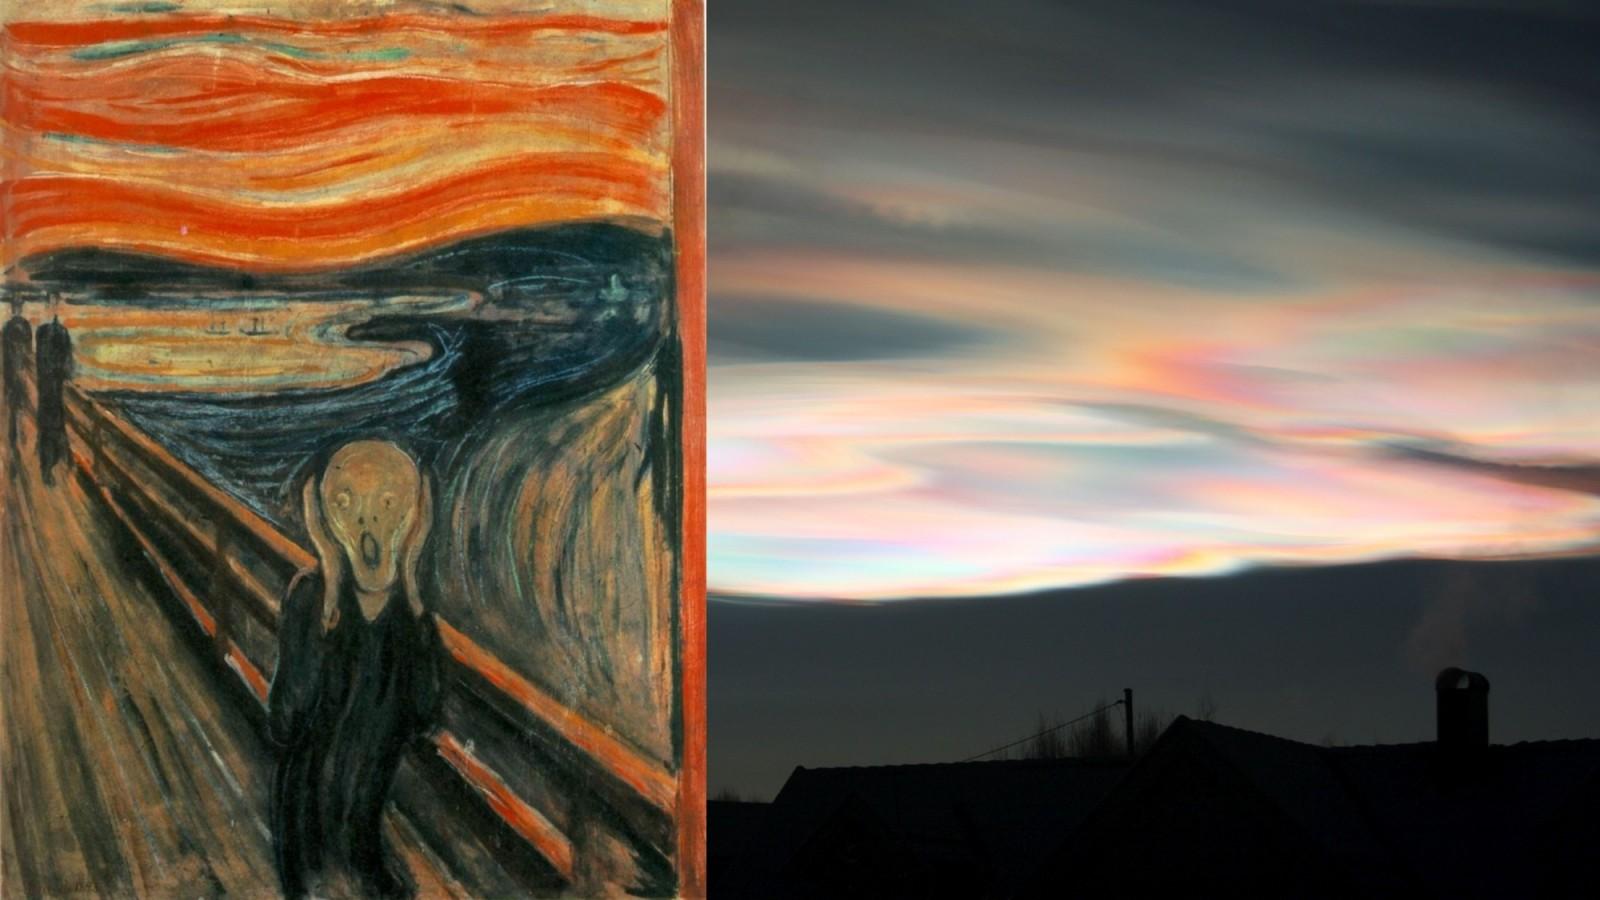 Geolog Extraordinary Iridescent Clouds Inspire Munchs